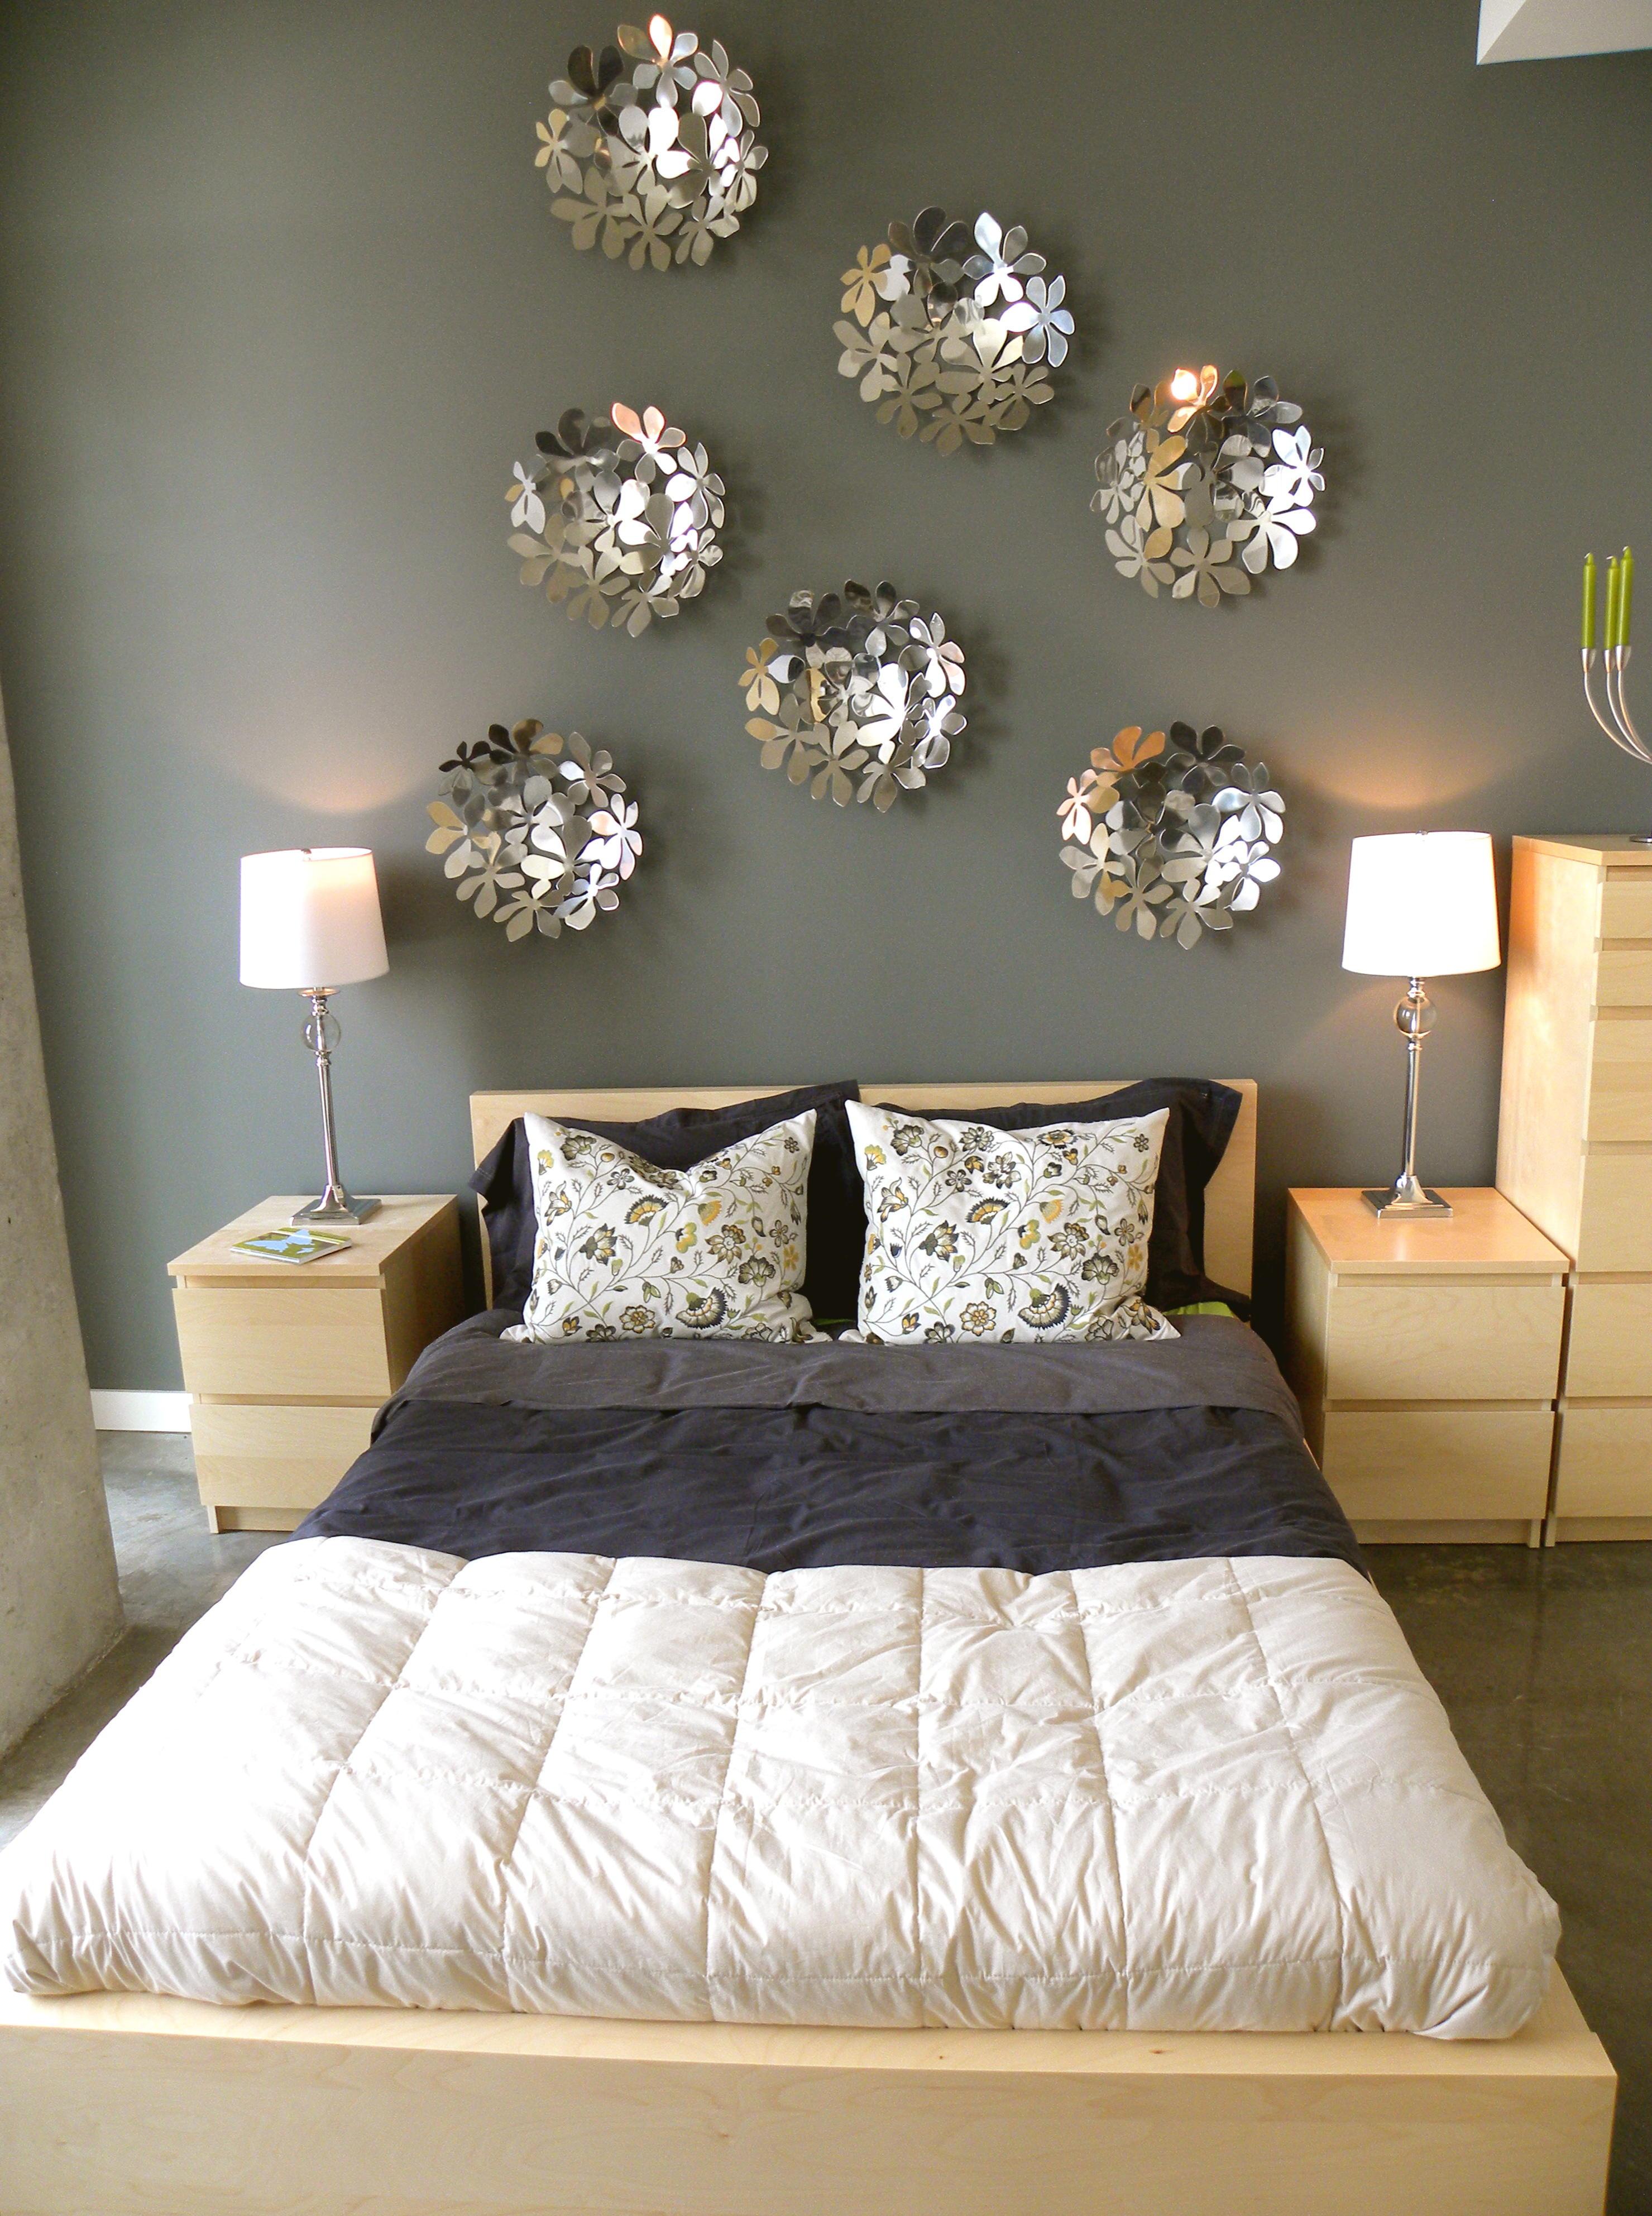 ModerNash Furniture Supply Corporation image 10